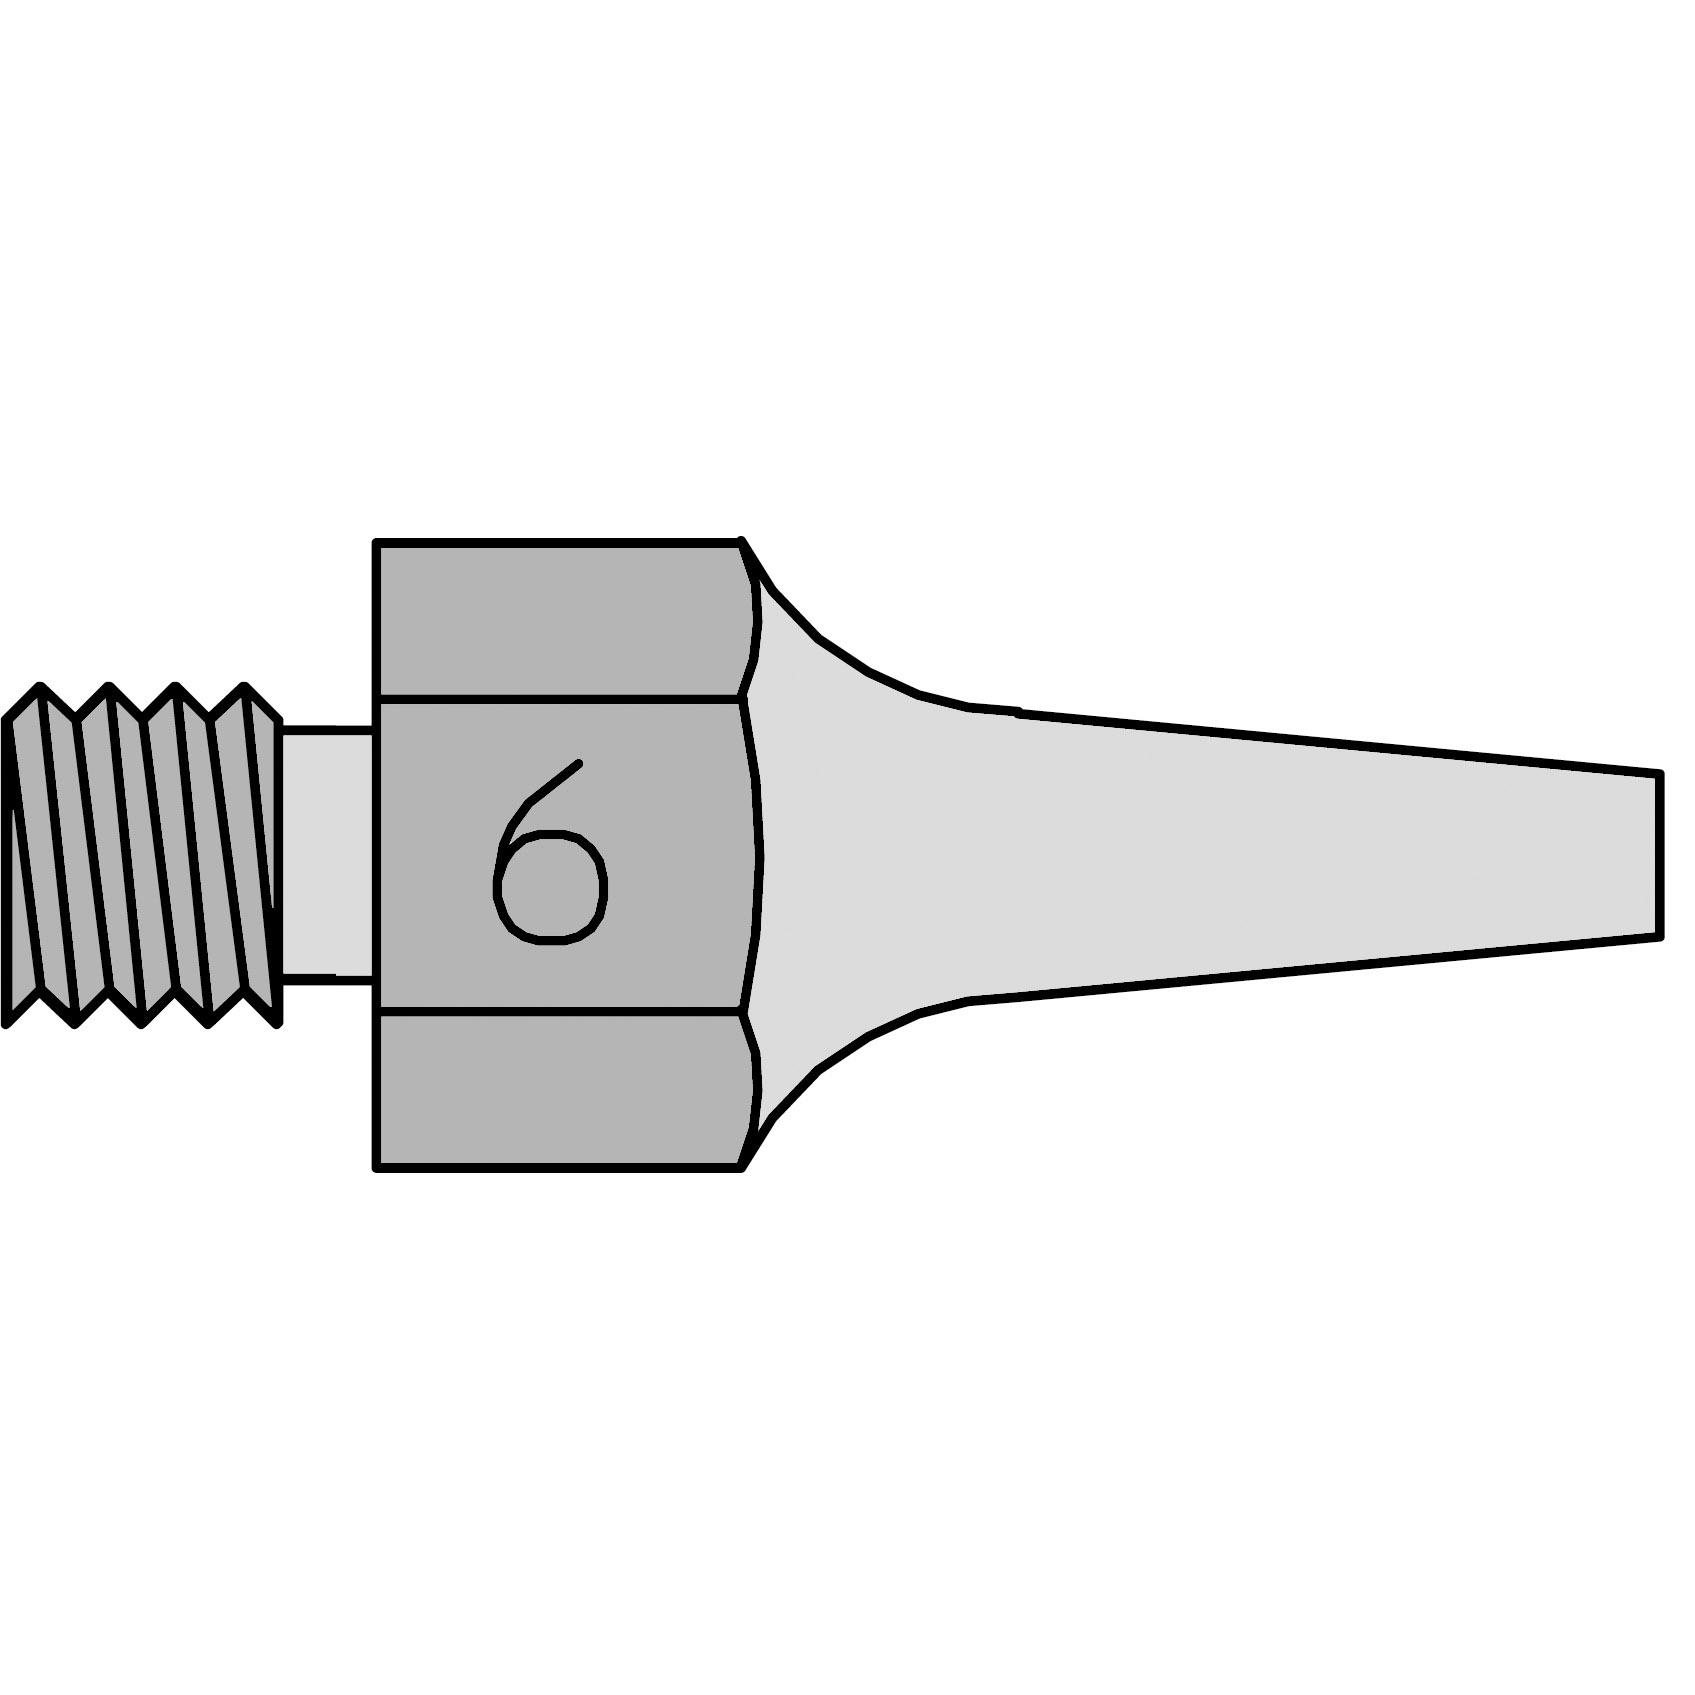 DS 116 Desoldering nozzle